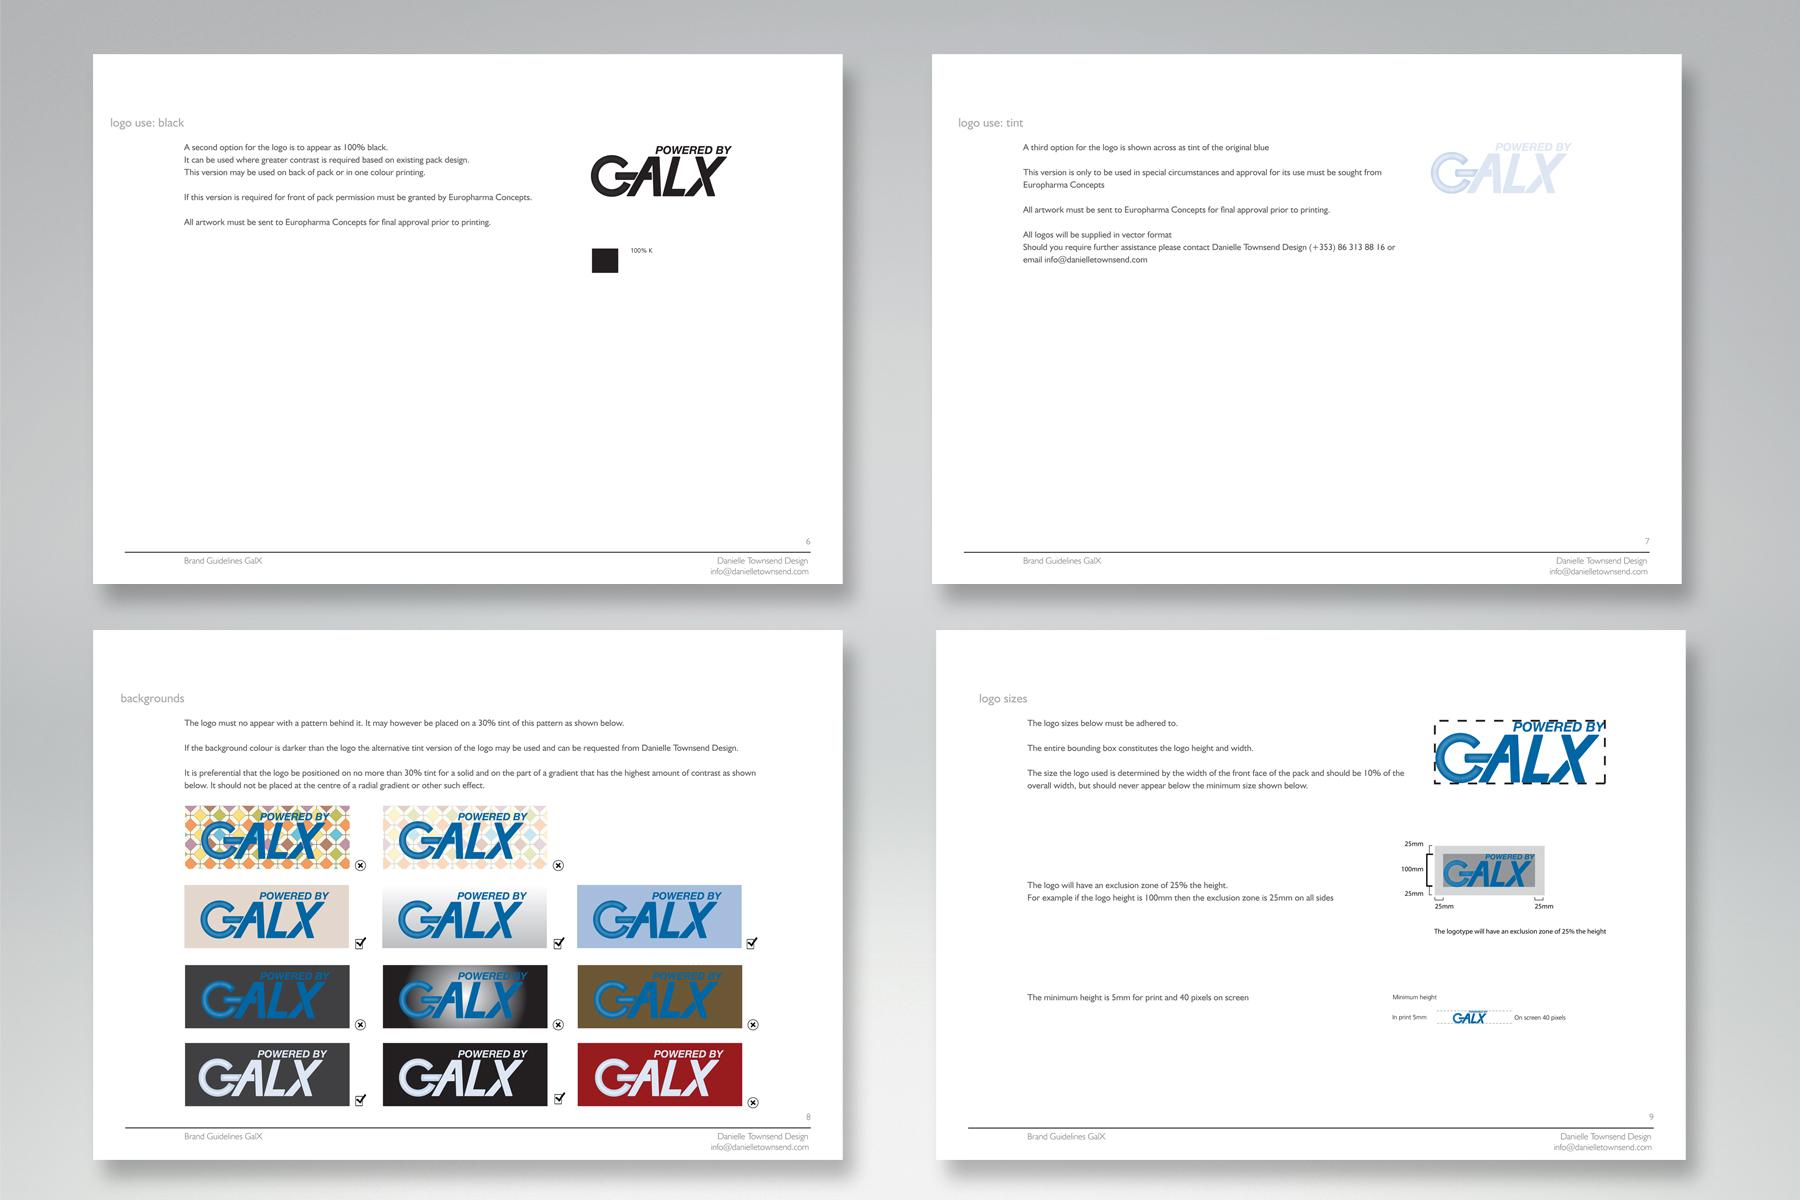 Galx-brand-guidelines1.jpg